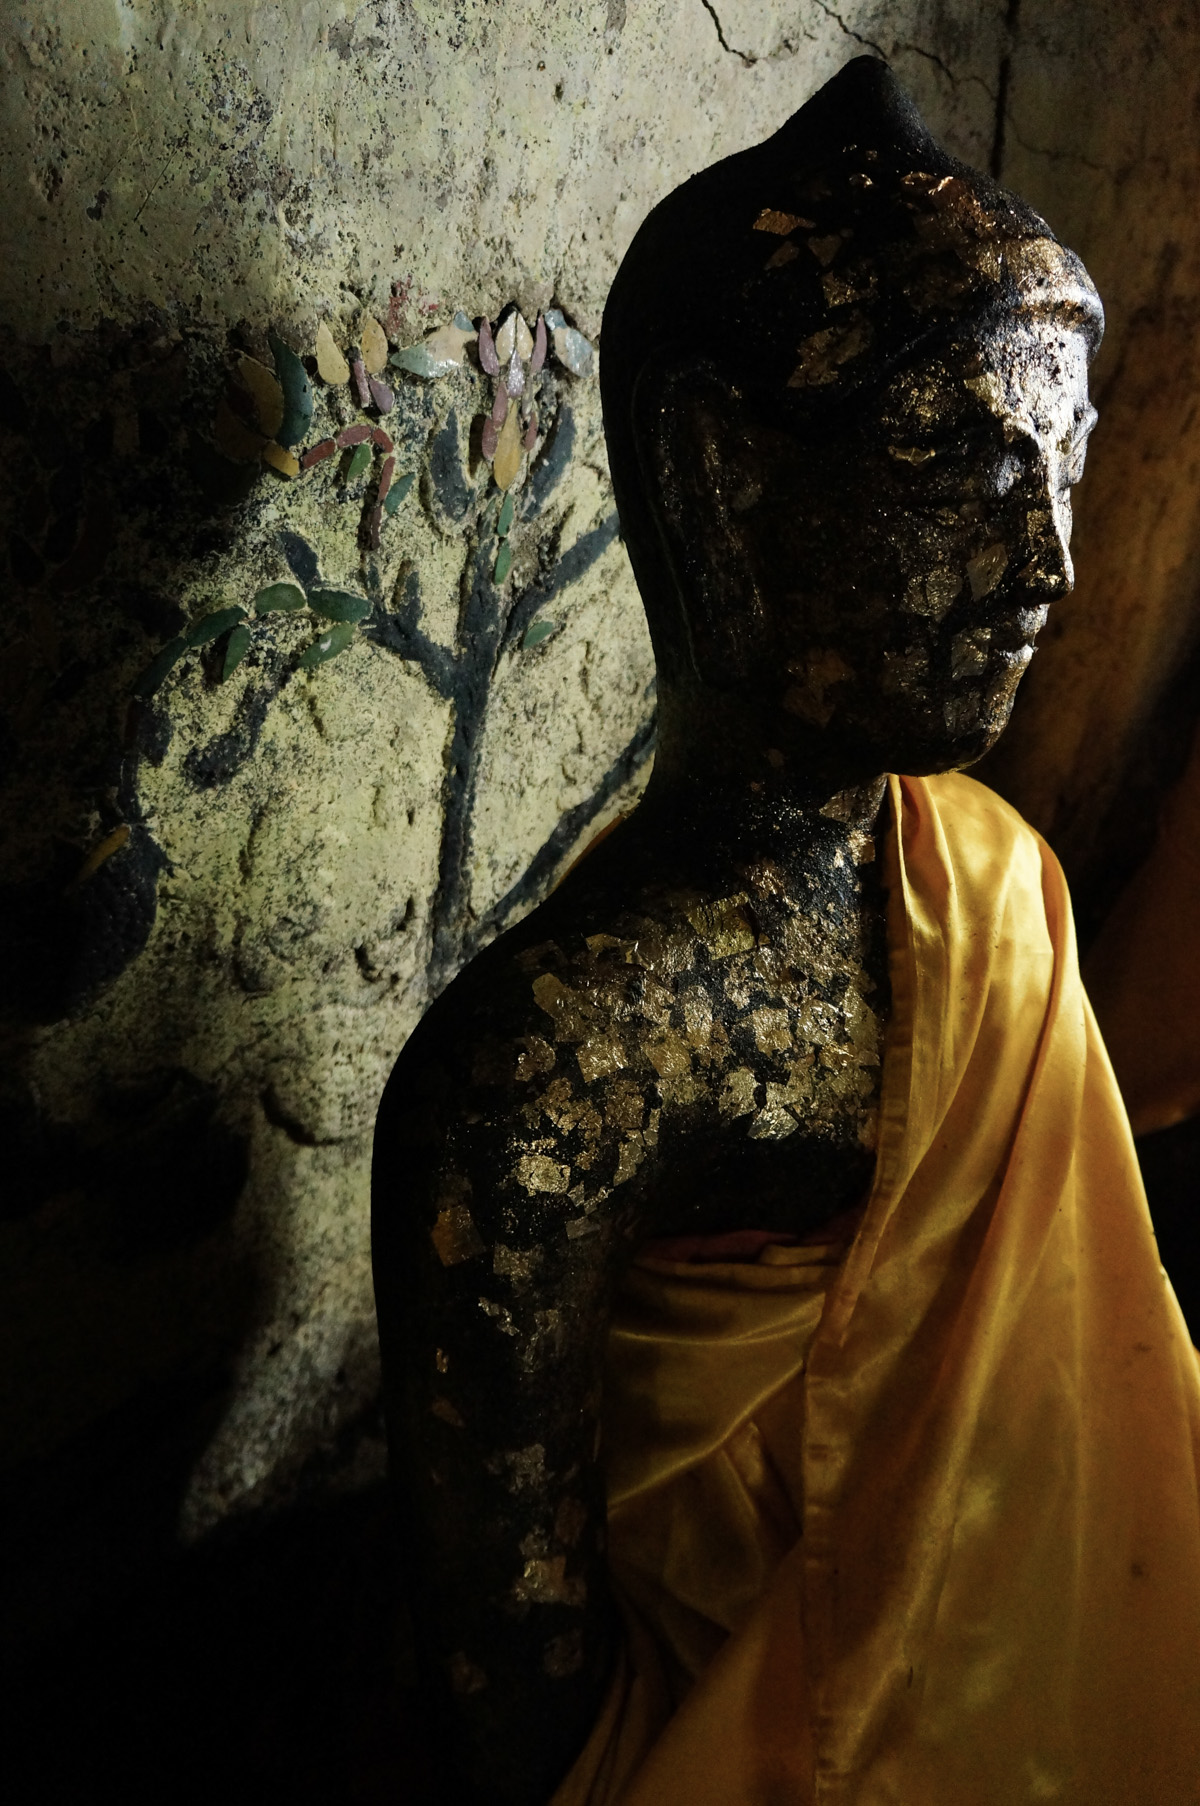 Buddha and bodhi tree